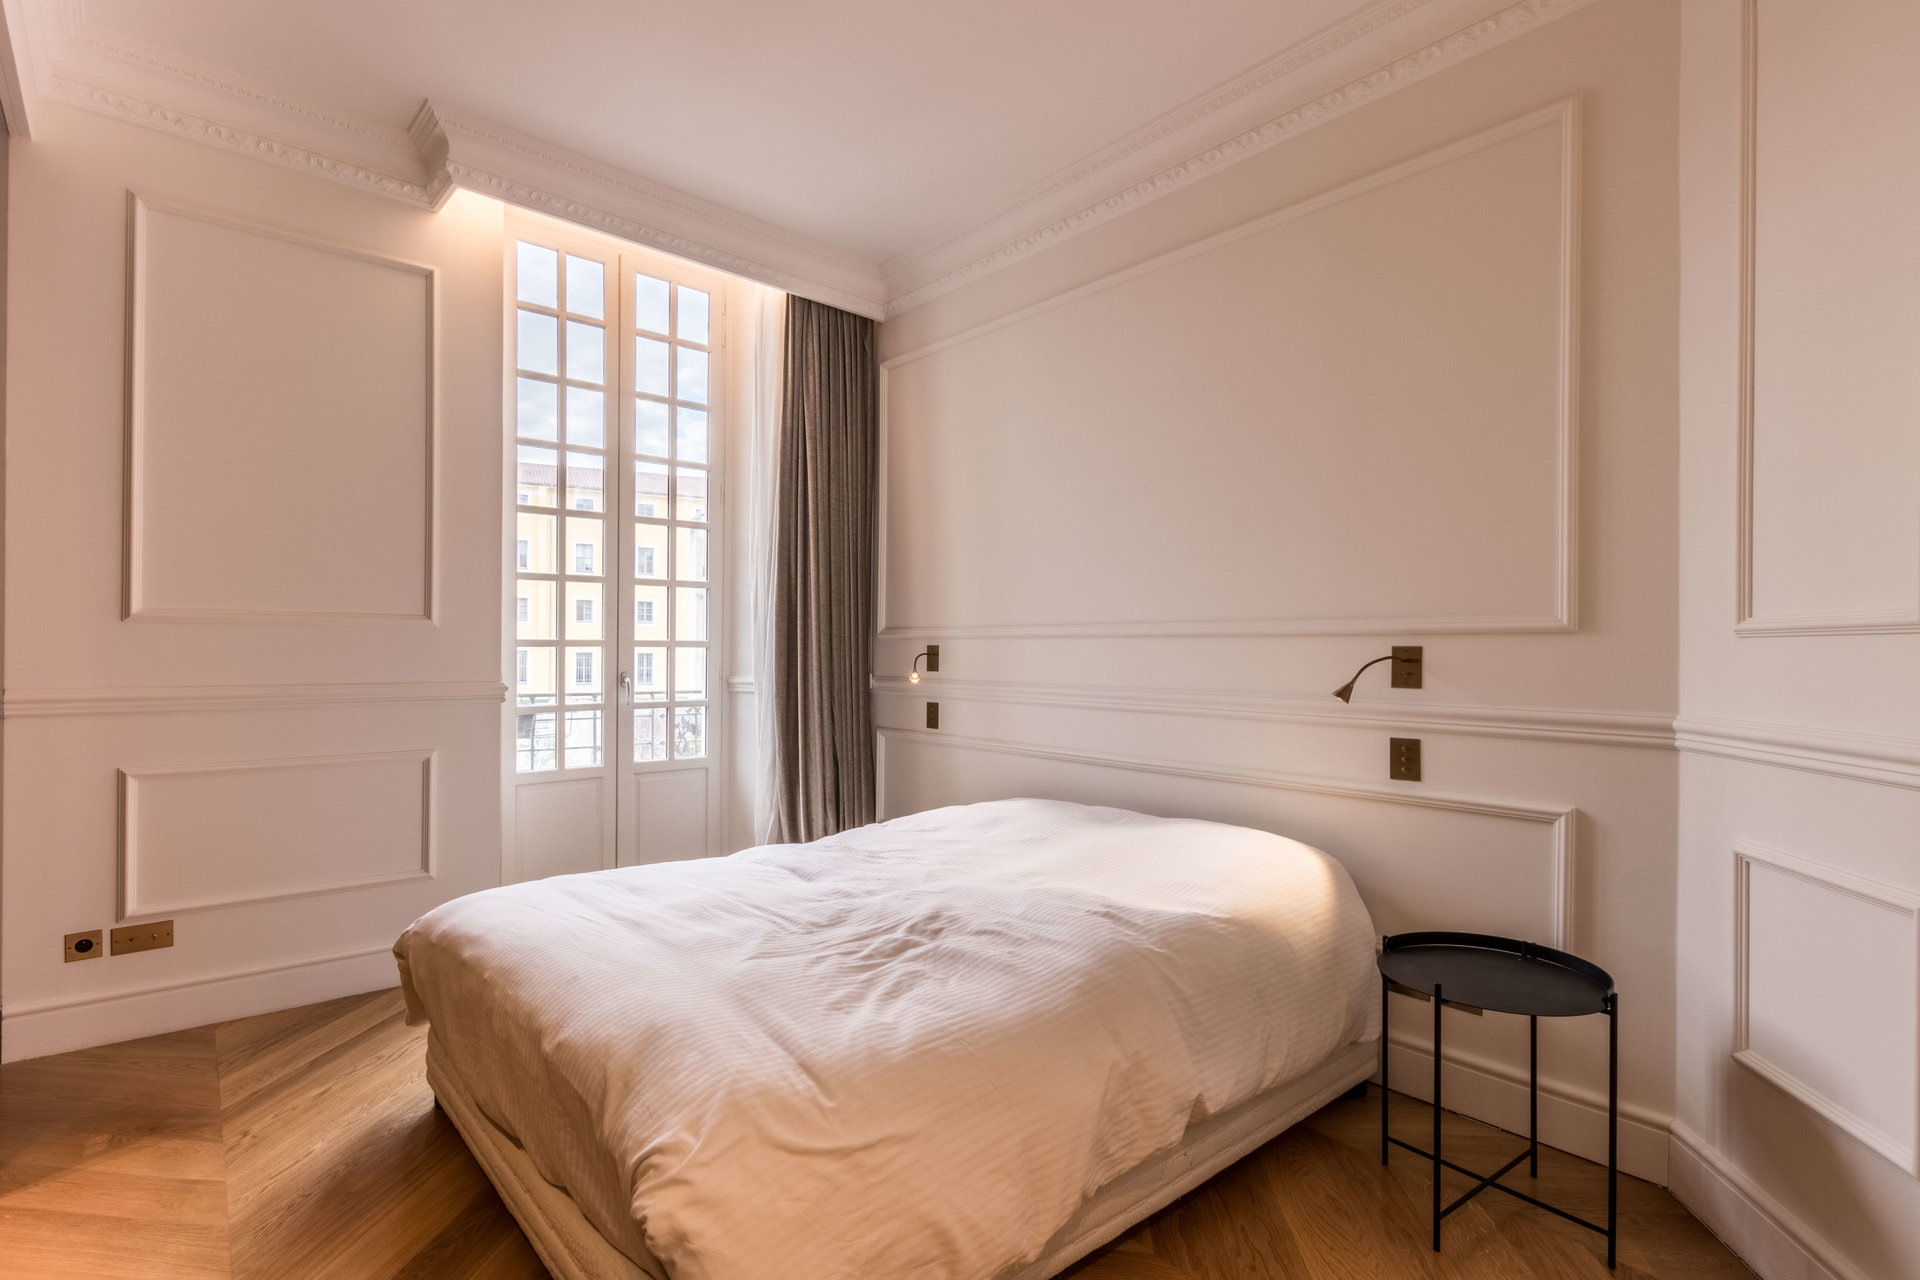 Apartment on Place Garibaldi with balcony